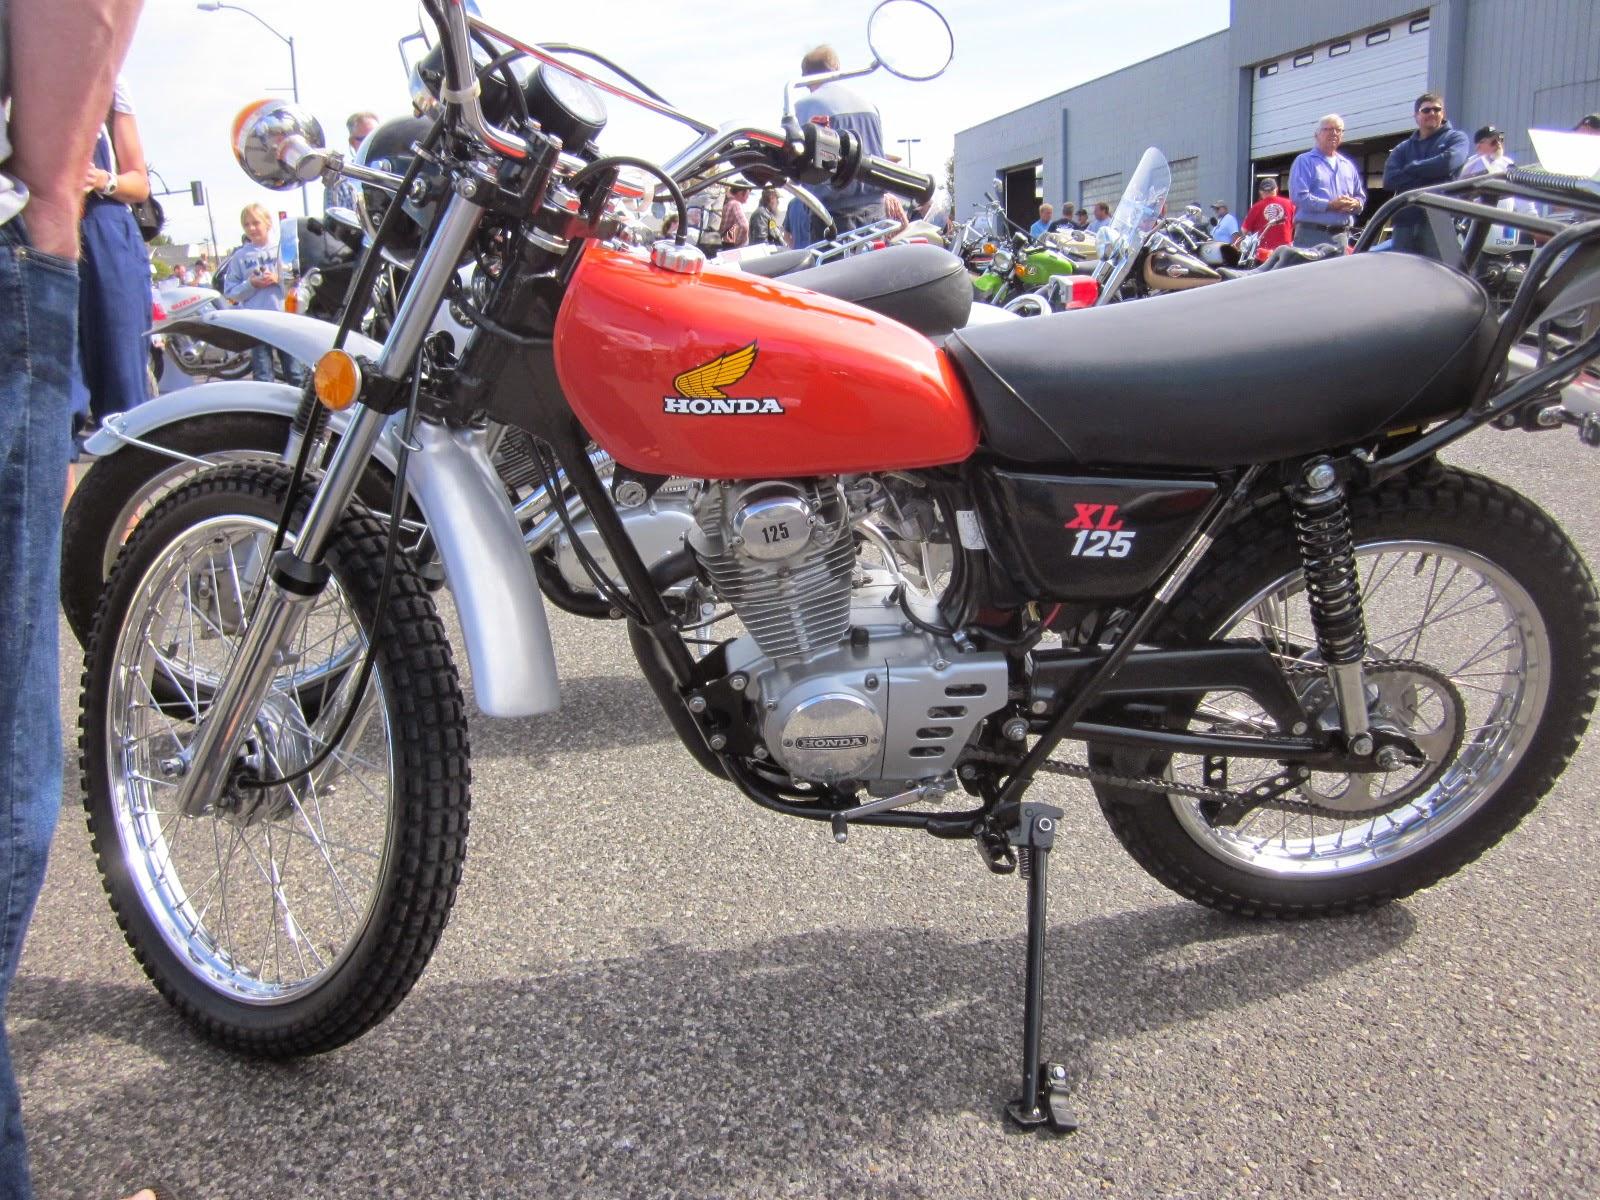 oldmotodude 1975 honda xl125 on display at the 2014 retro riders vintage motorcycle show. Black Bedroom Furniture Sets. Home Design Ideas